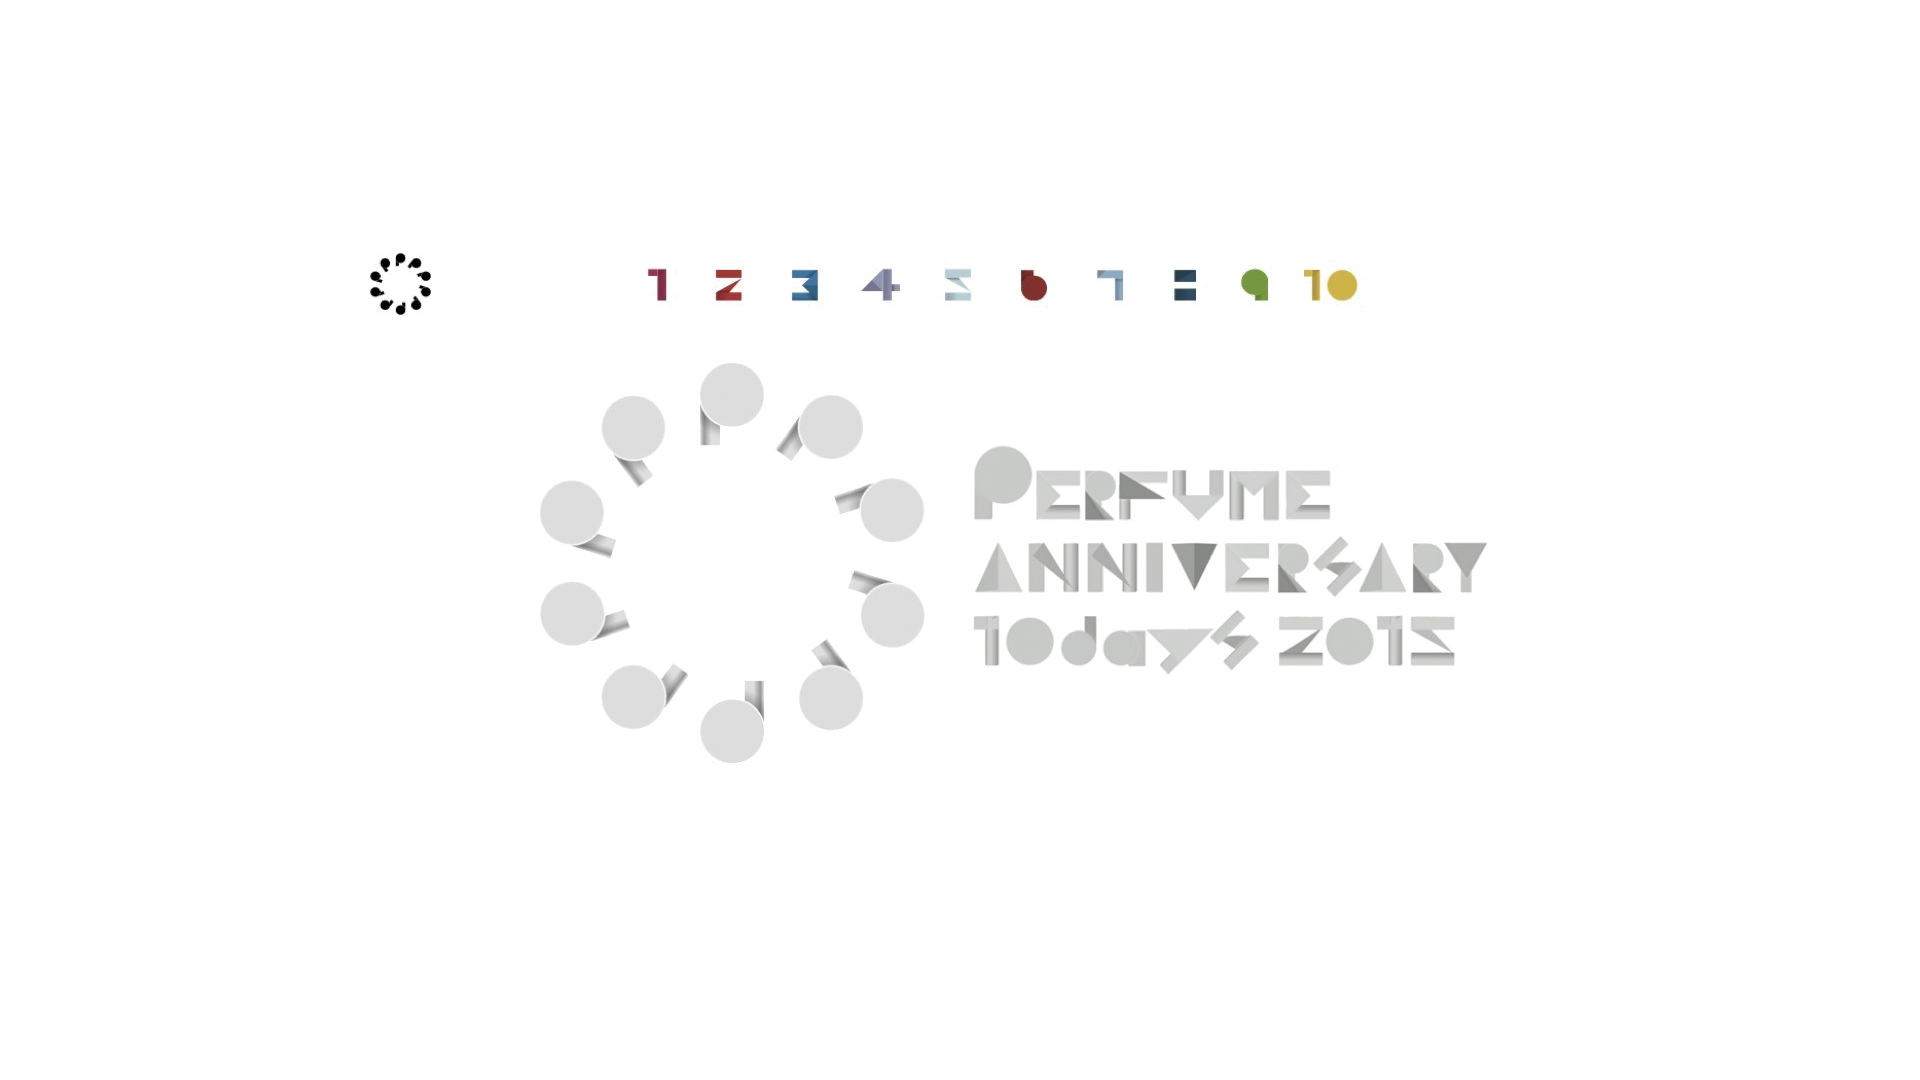 Perfume Anniversary 10days 2015 PPPPPPPPPP LIVE 3:5:6:9 /LOGO